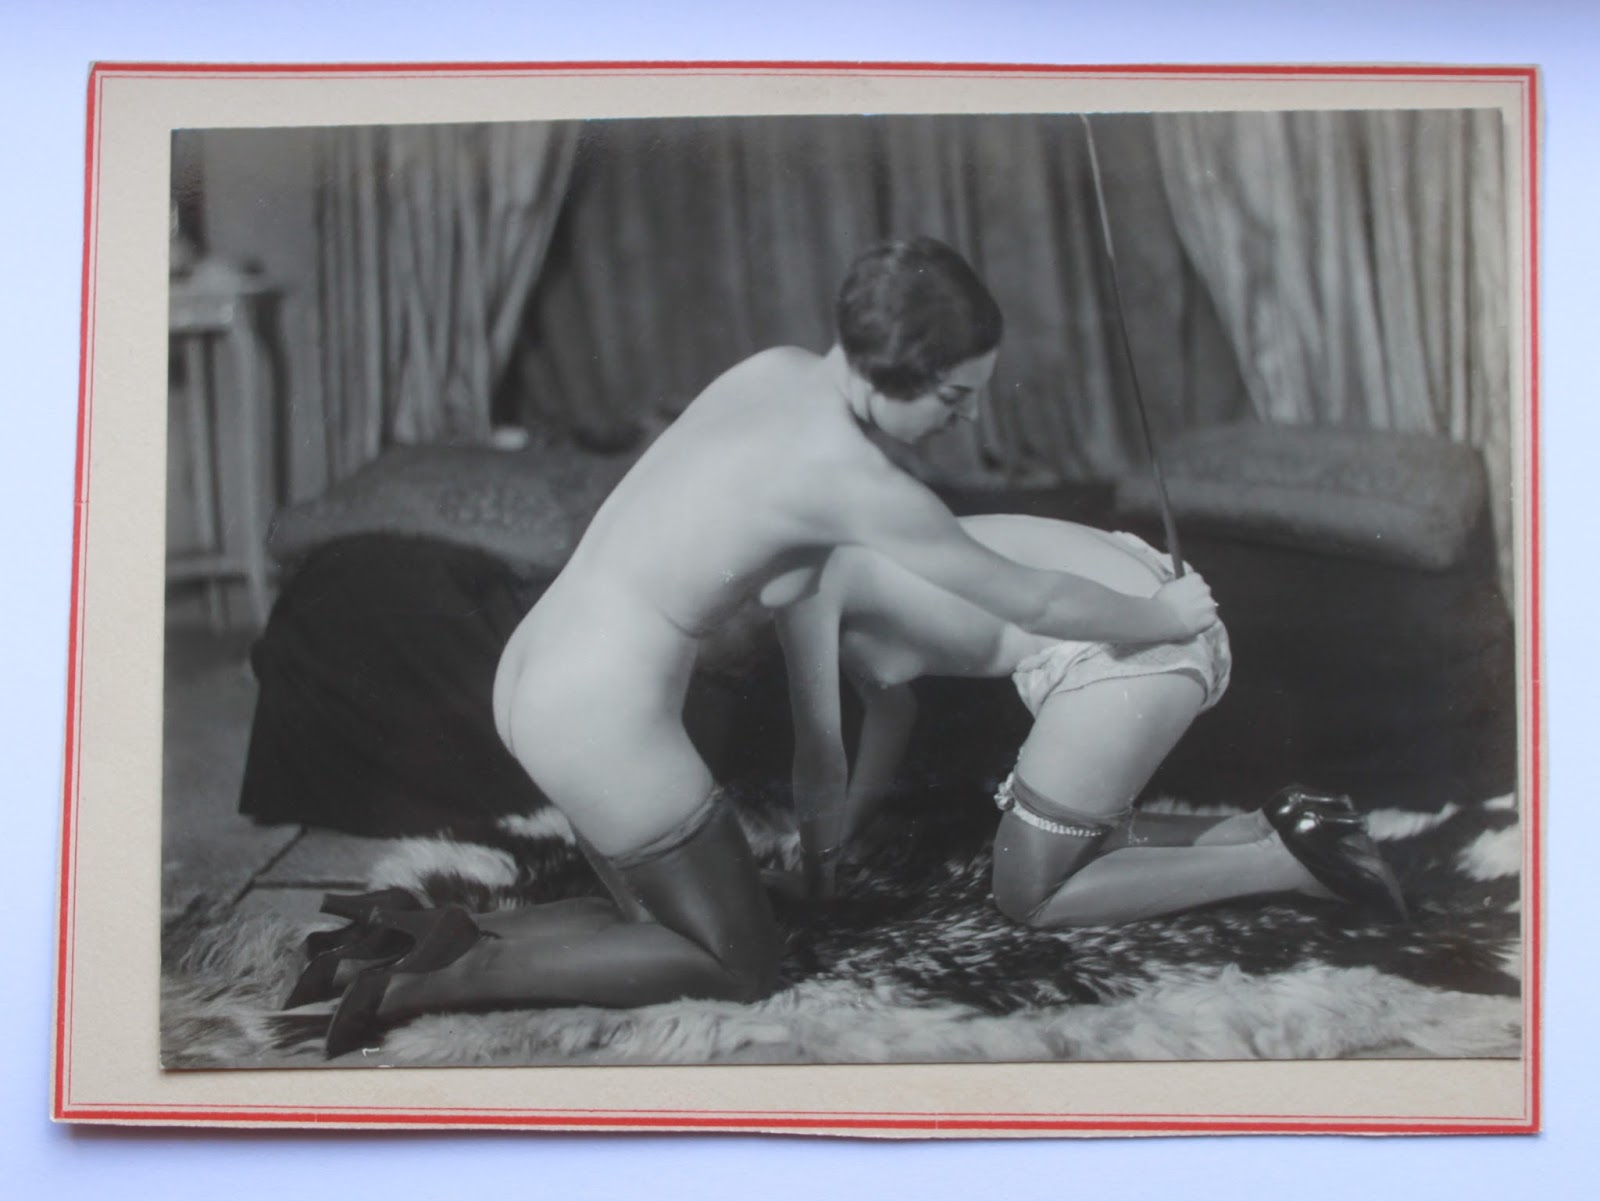 porno vintage italien rencontre dominatrice